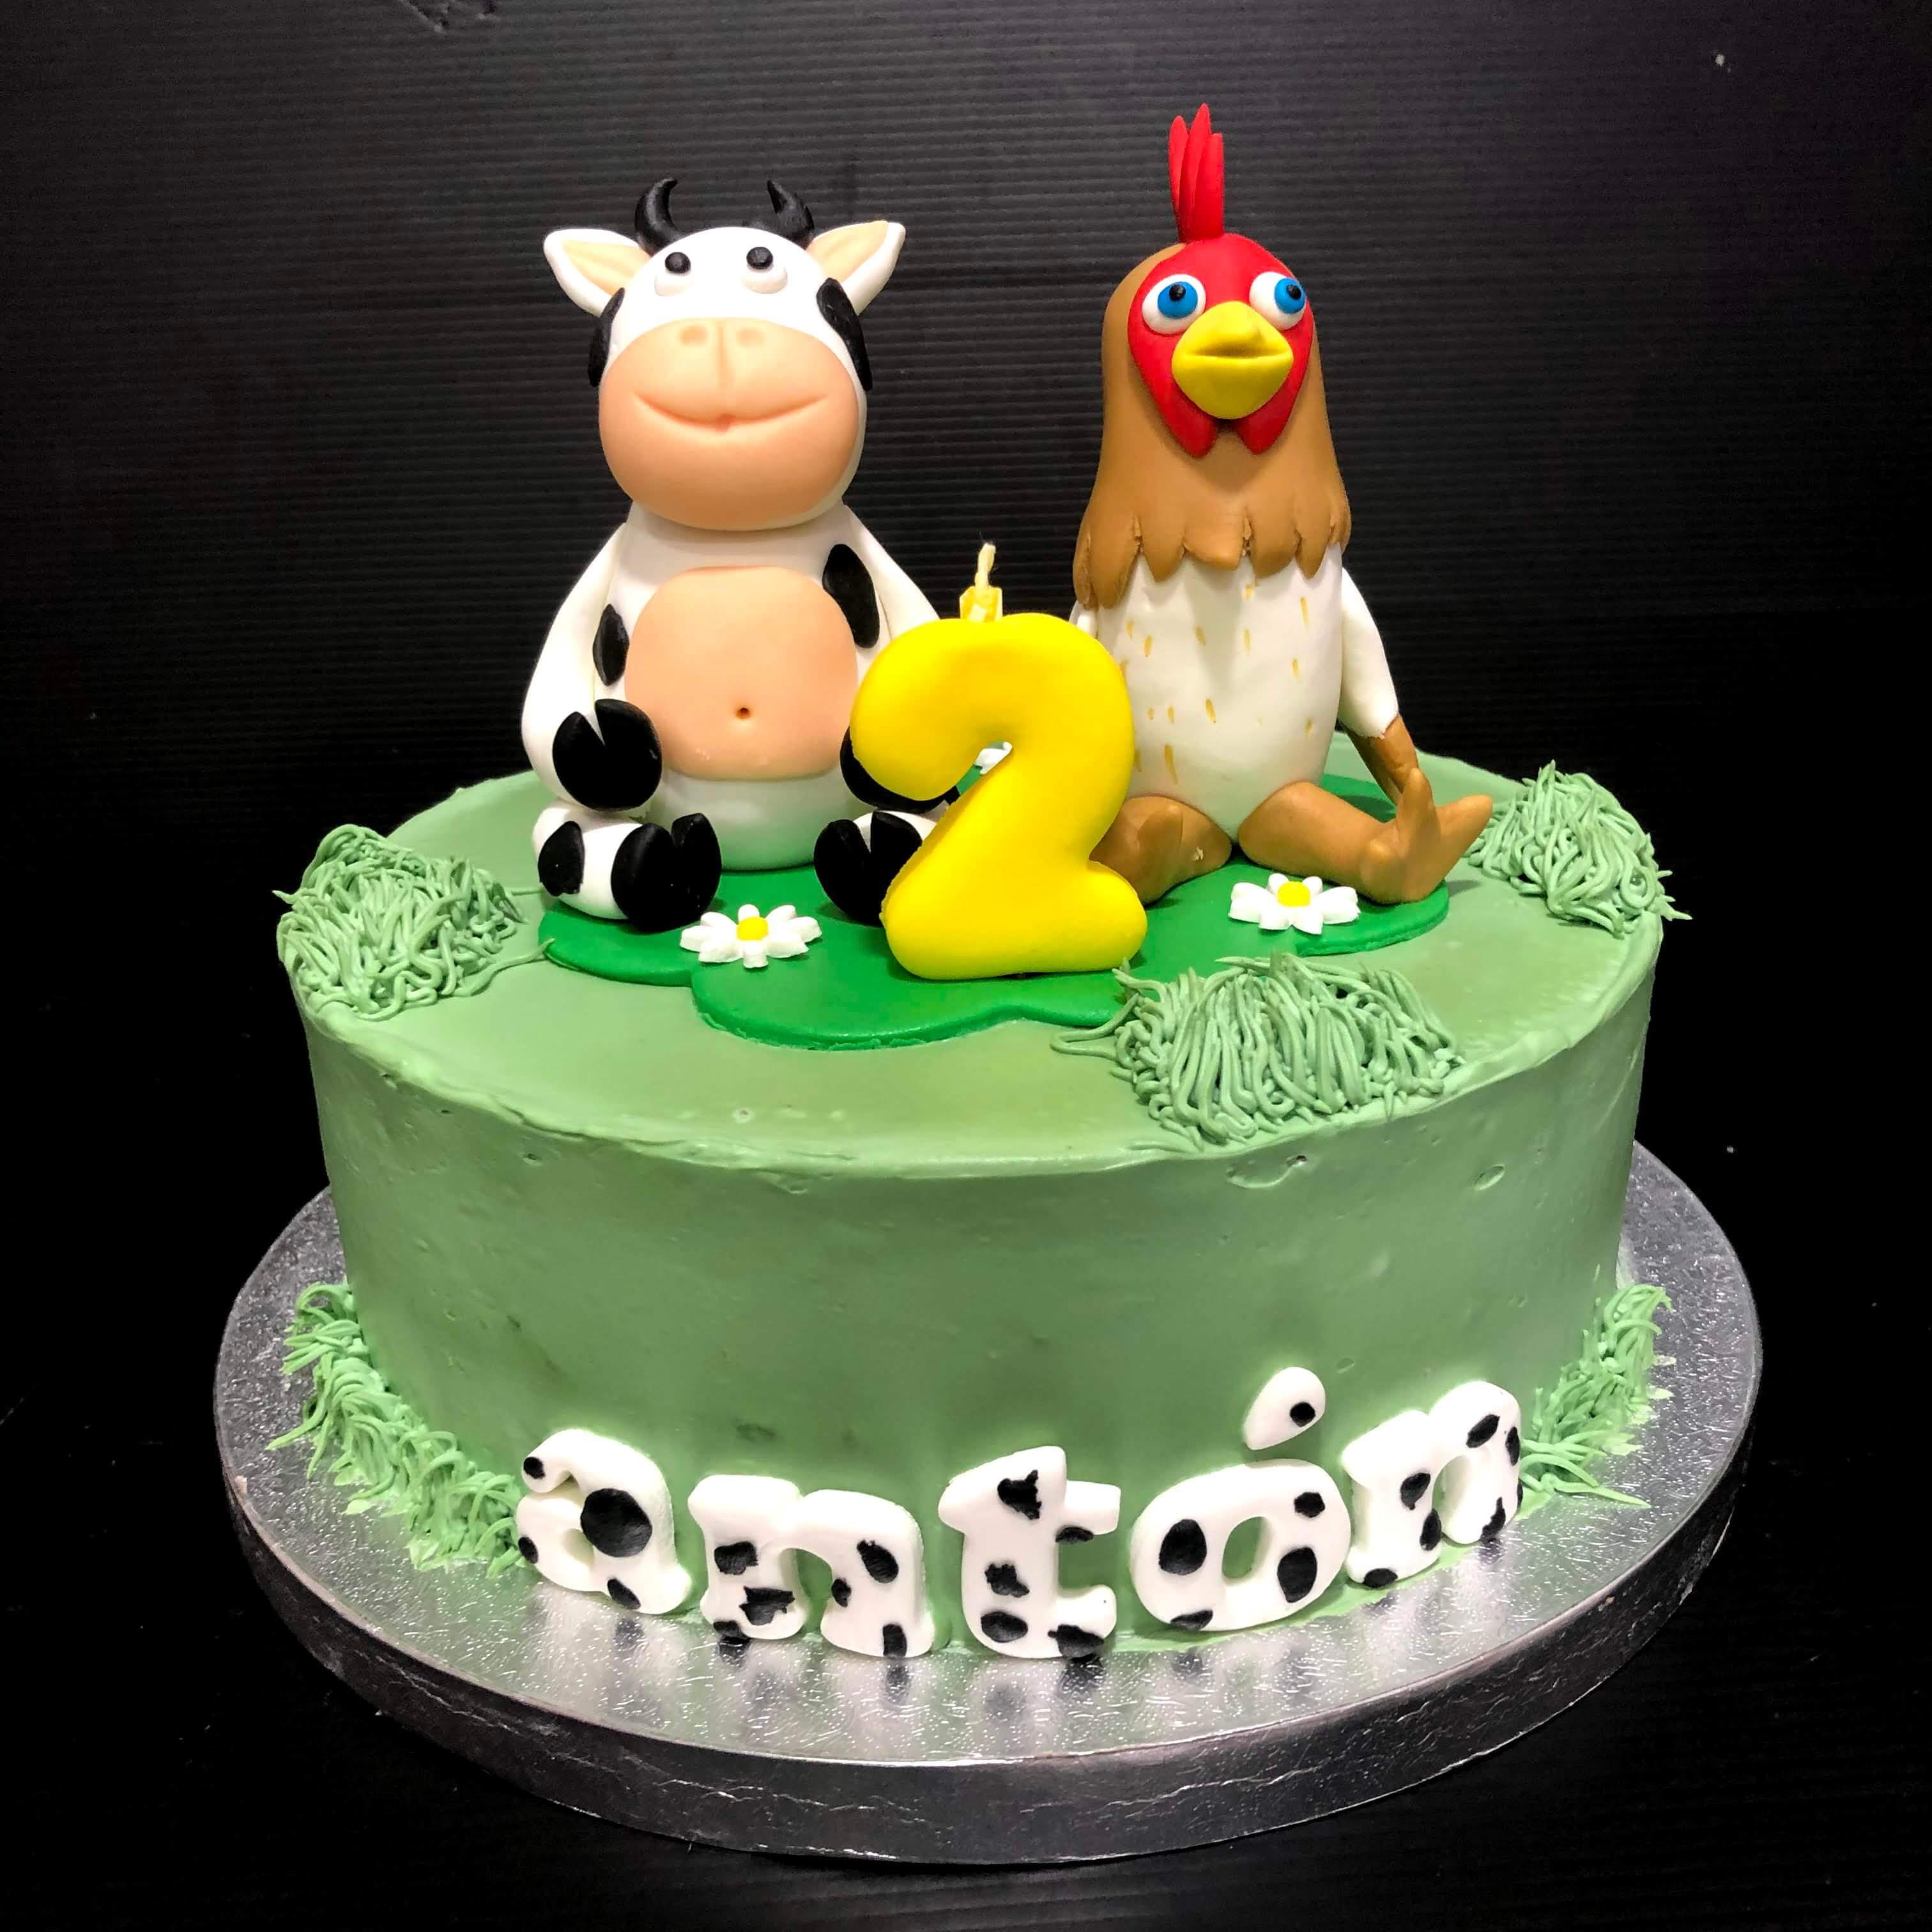 Tarta granja vaca y gallina